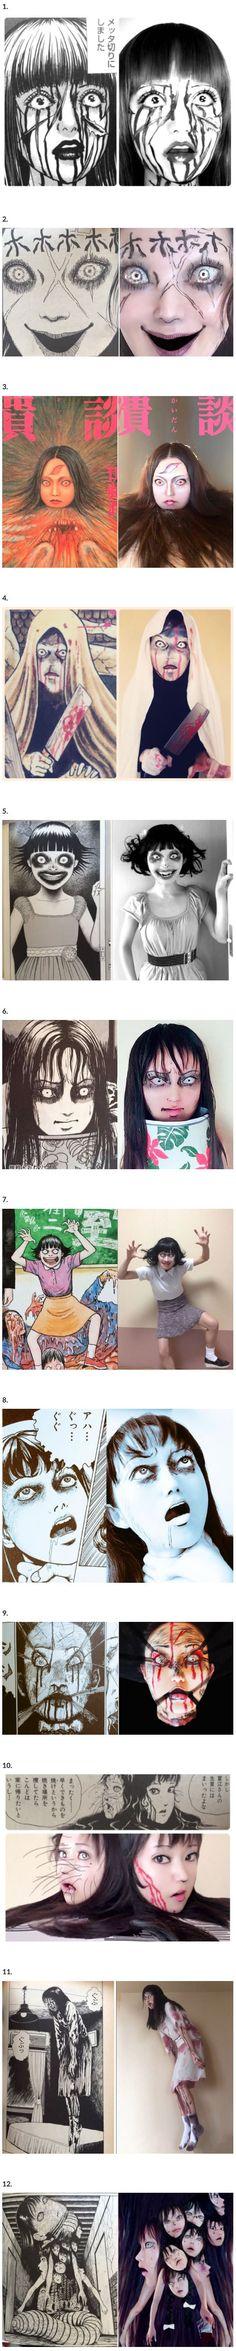 This Japanese Cosplayer Ikura Brings Creepy Manga into Terrifying Reality